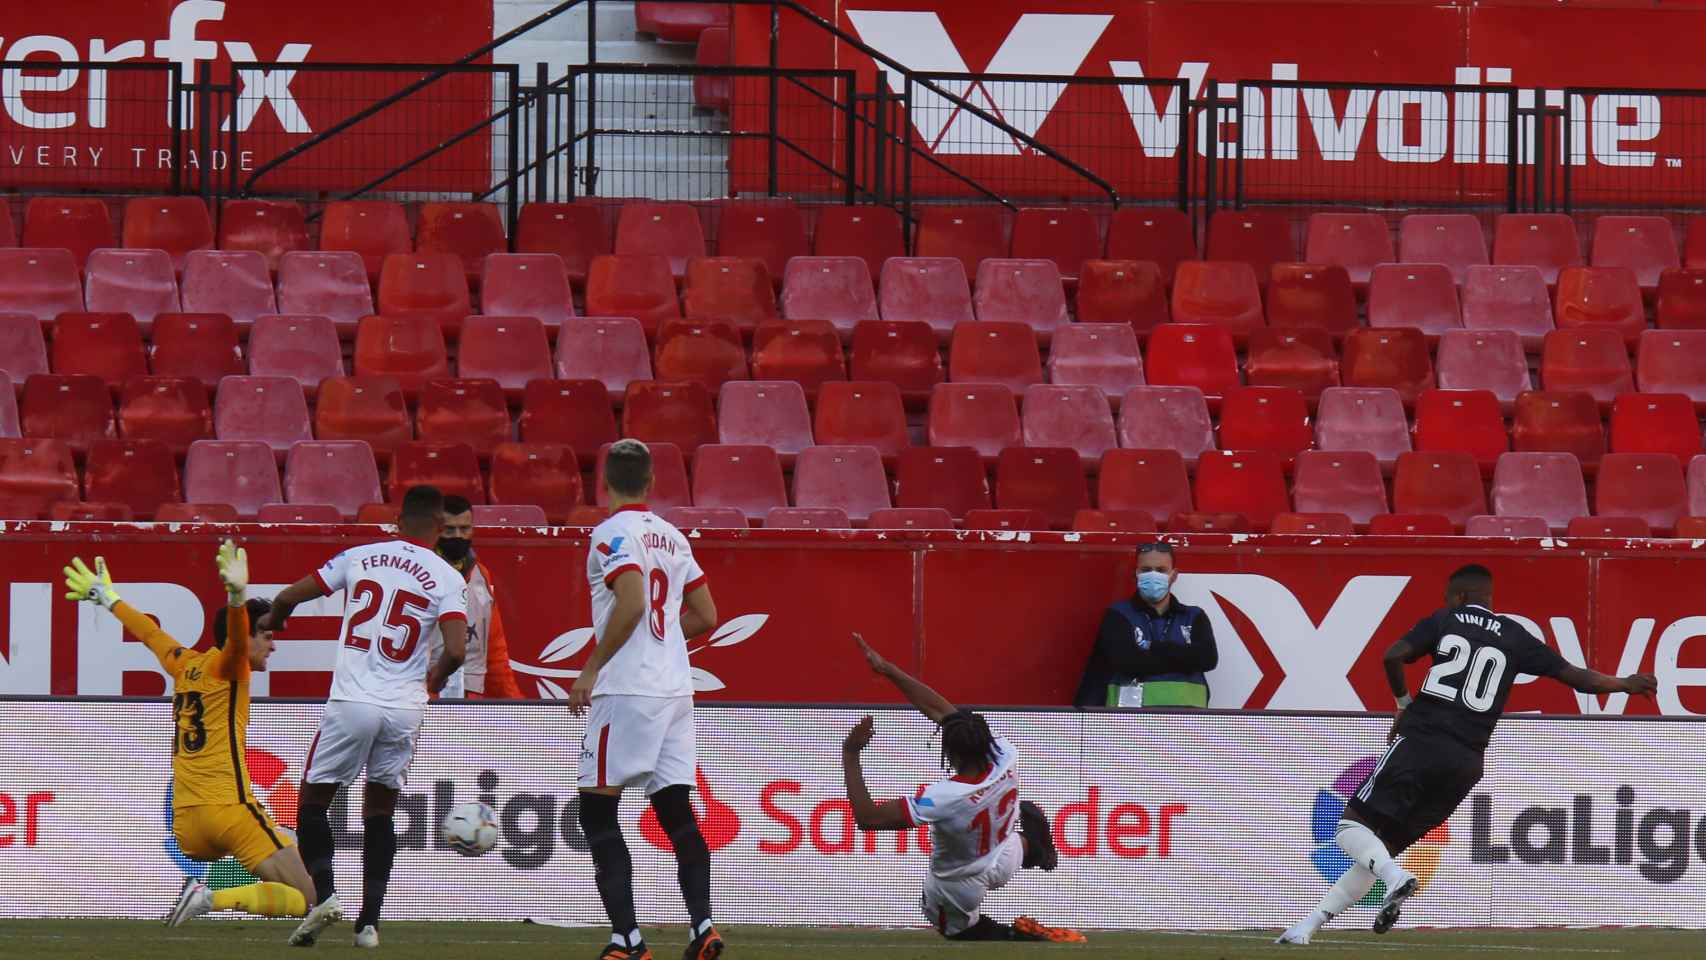 Vinicius dispara ante Bono pero no logra marcar gol